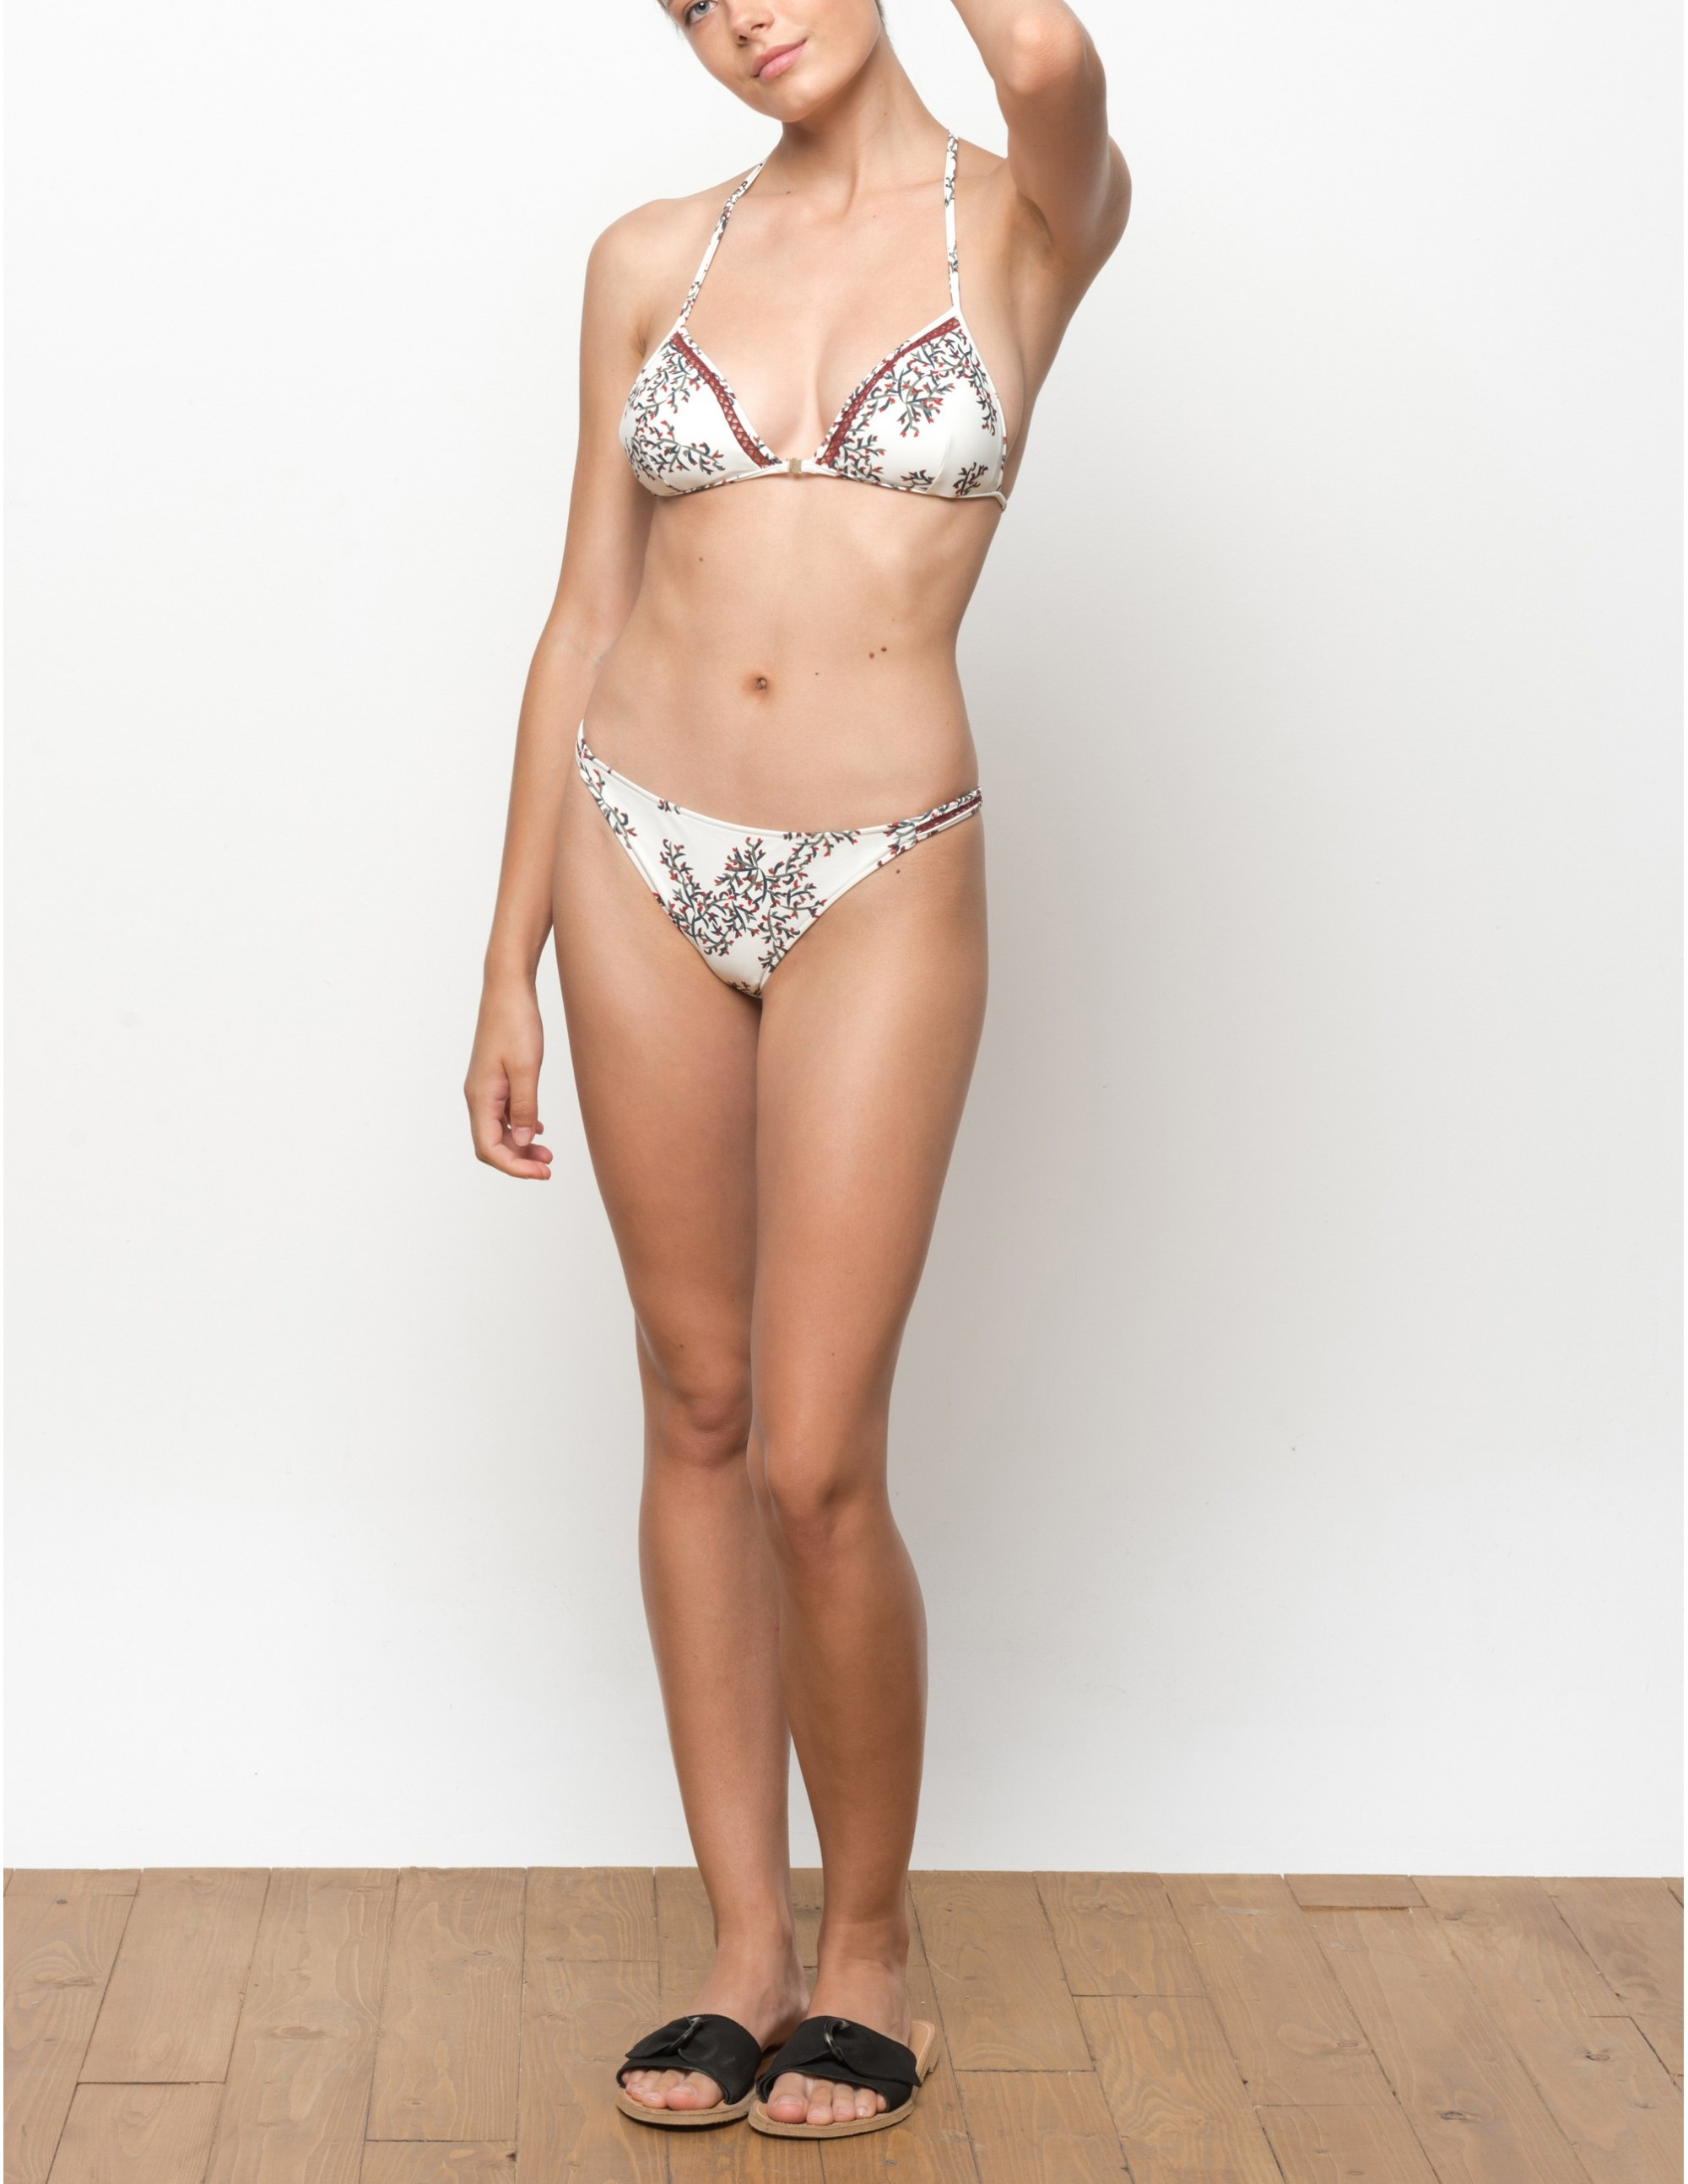 ANAMUR bikini bottom - ACACIA